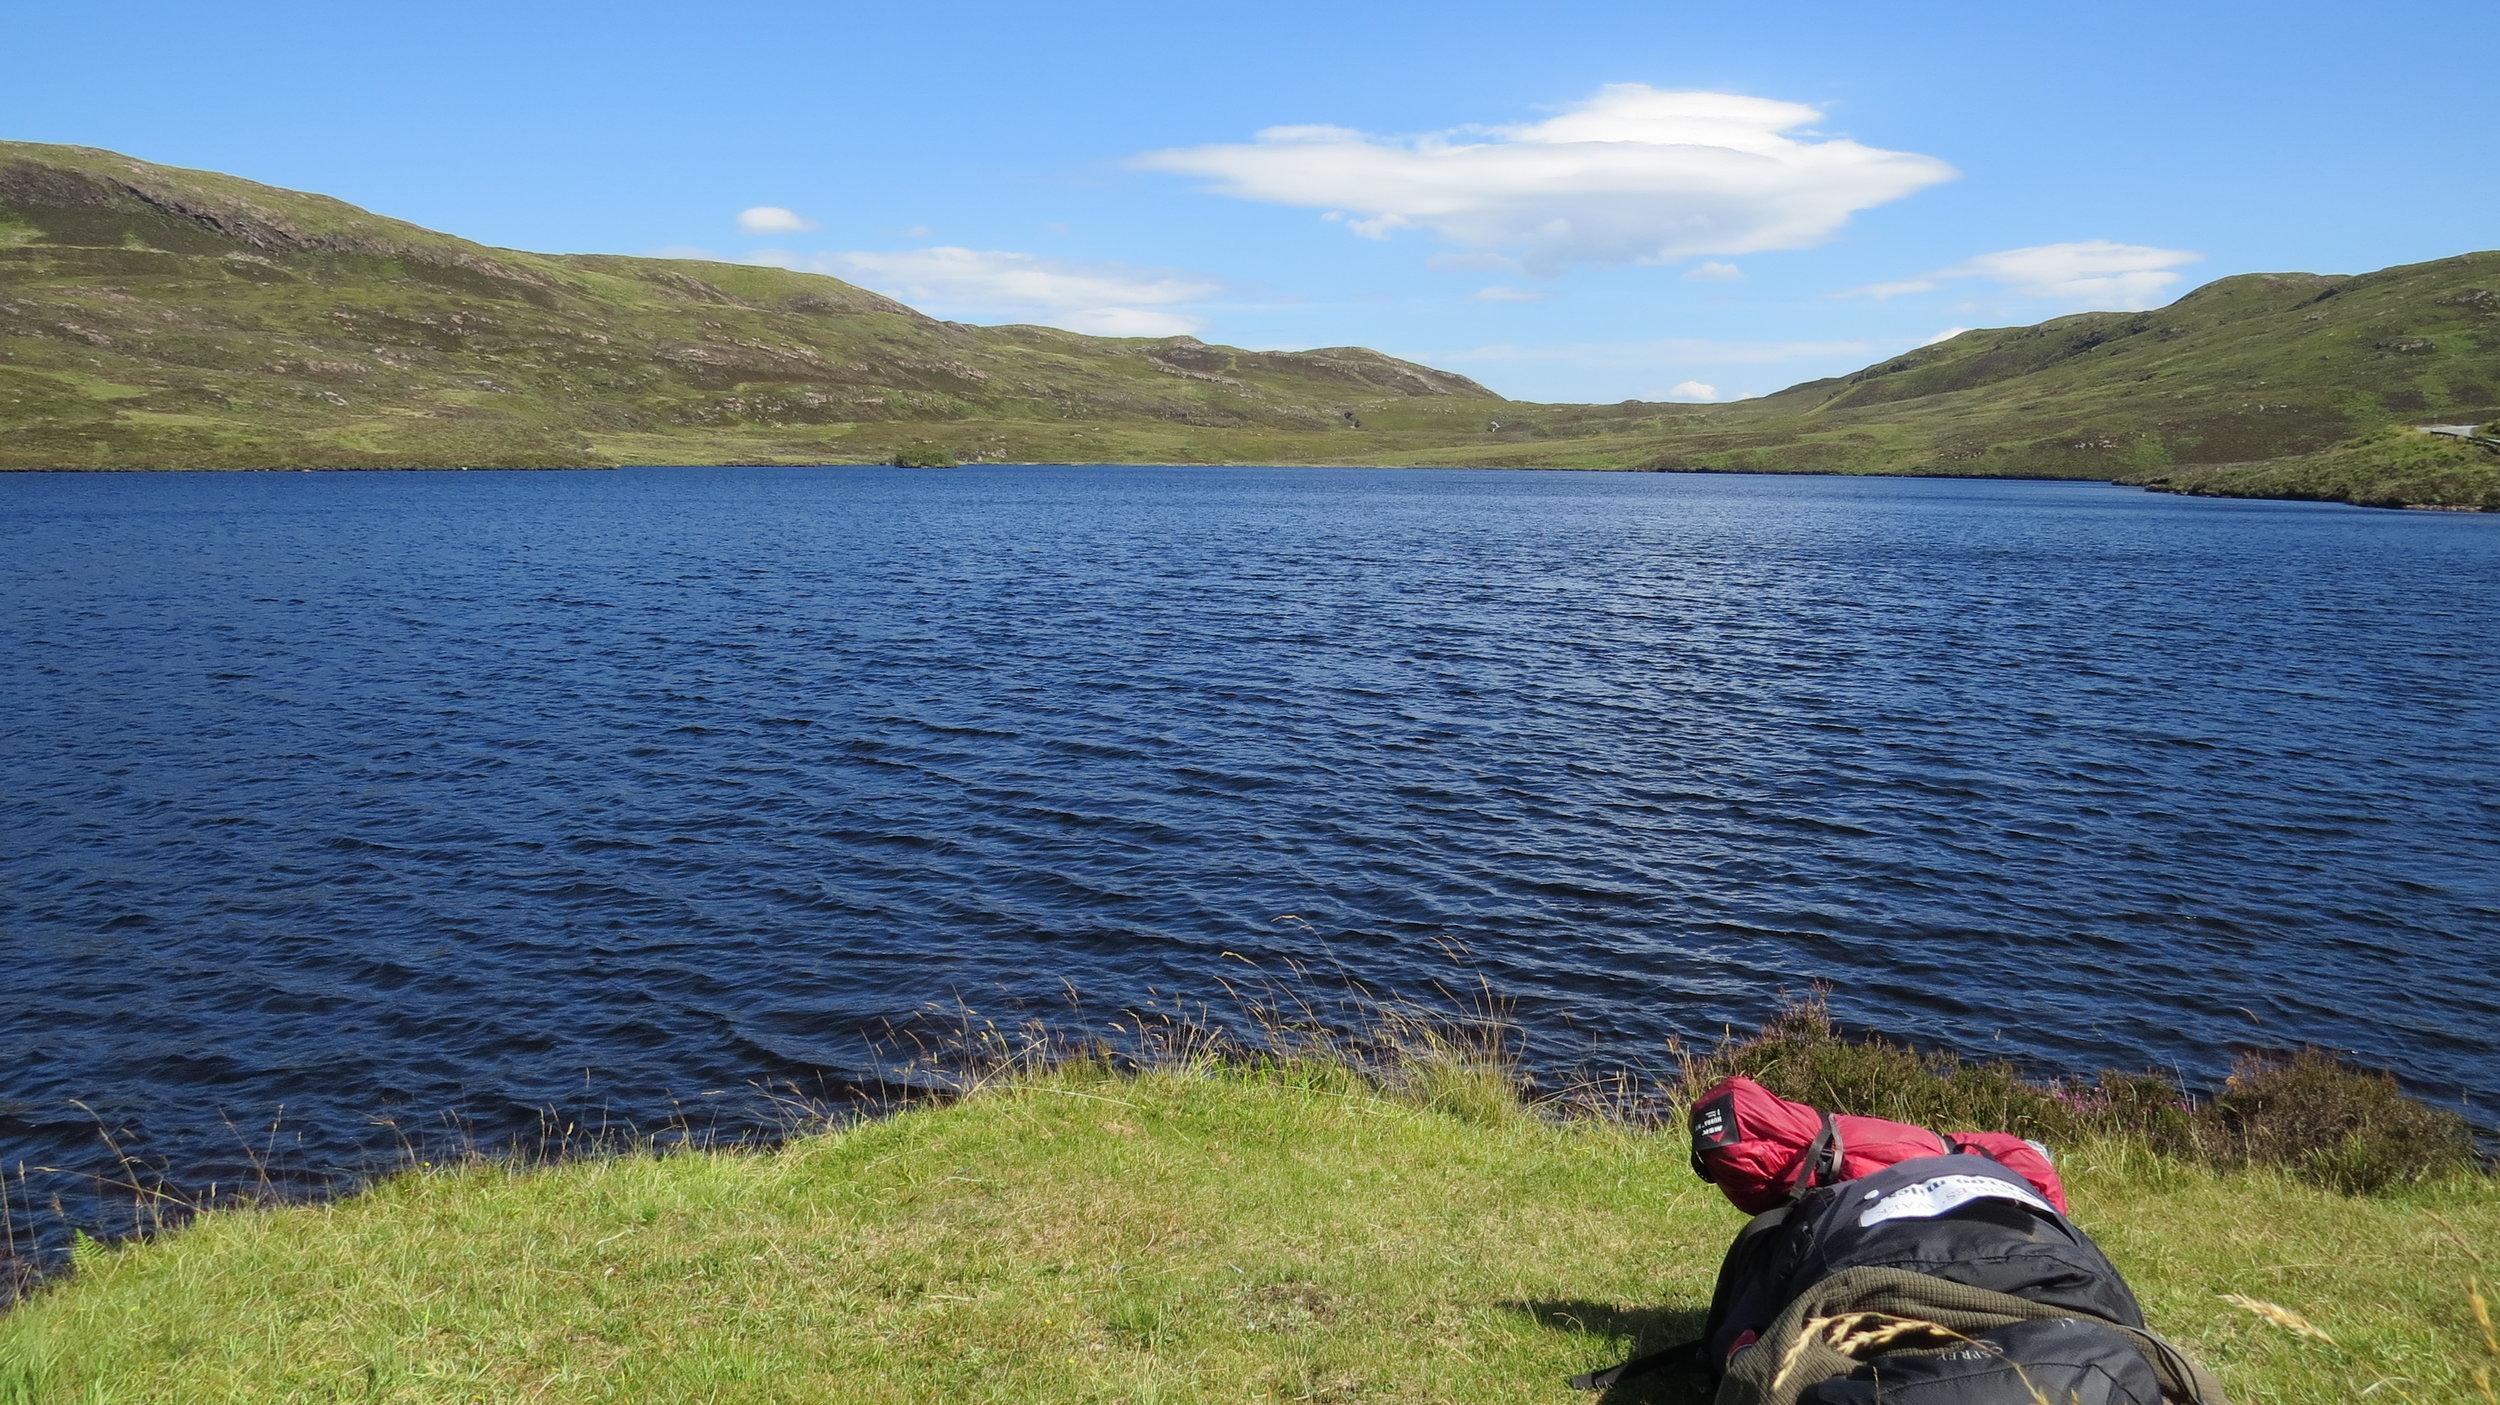 Lunch by Loch Dhughaill